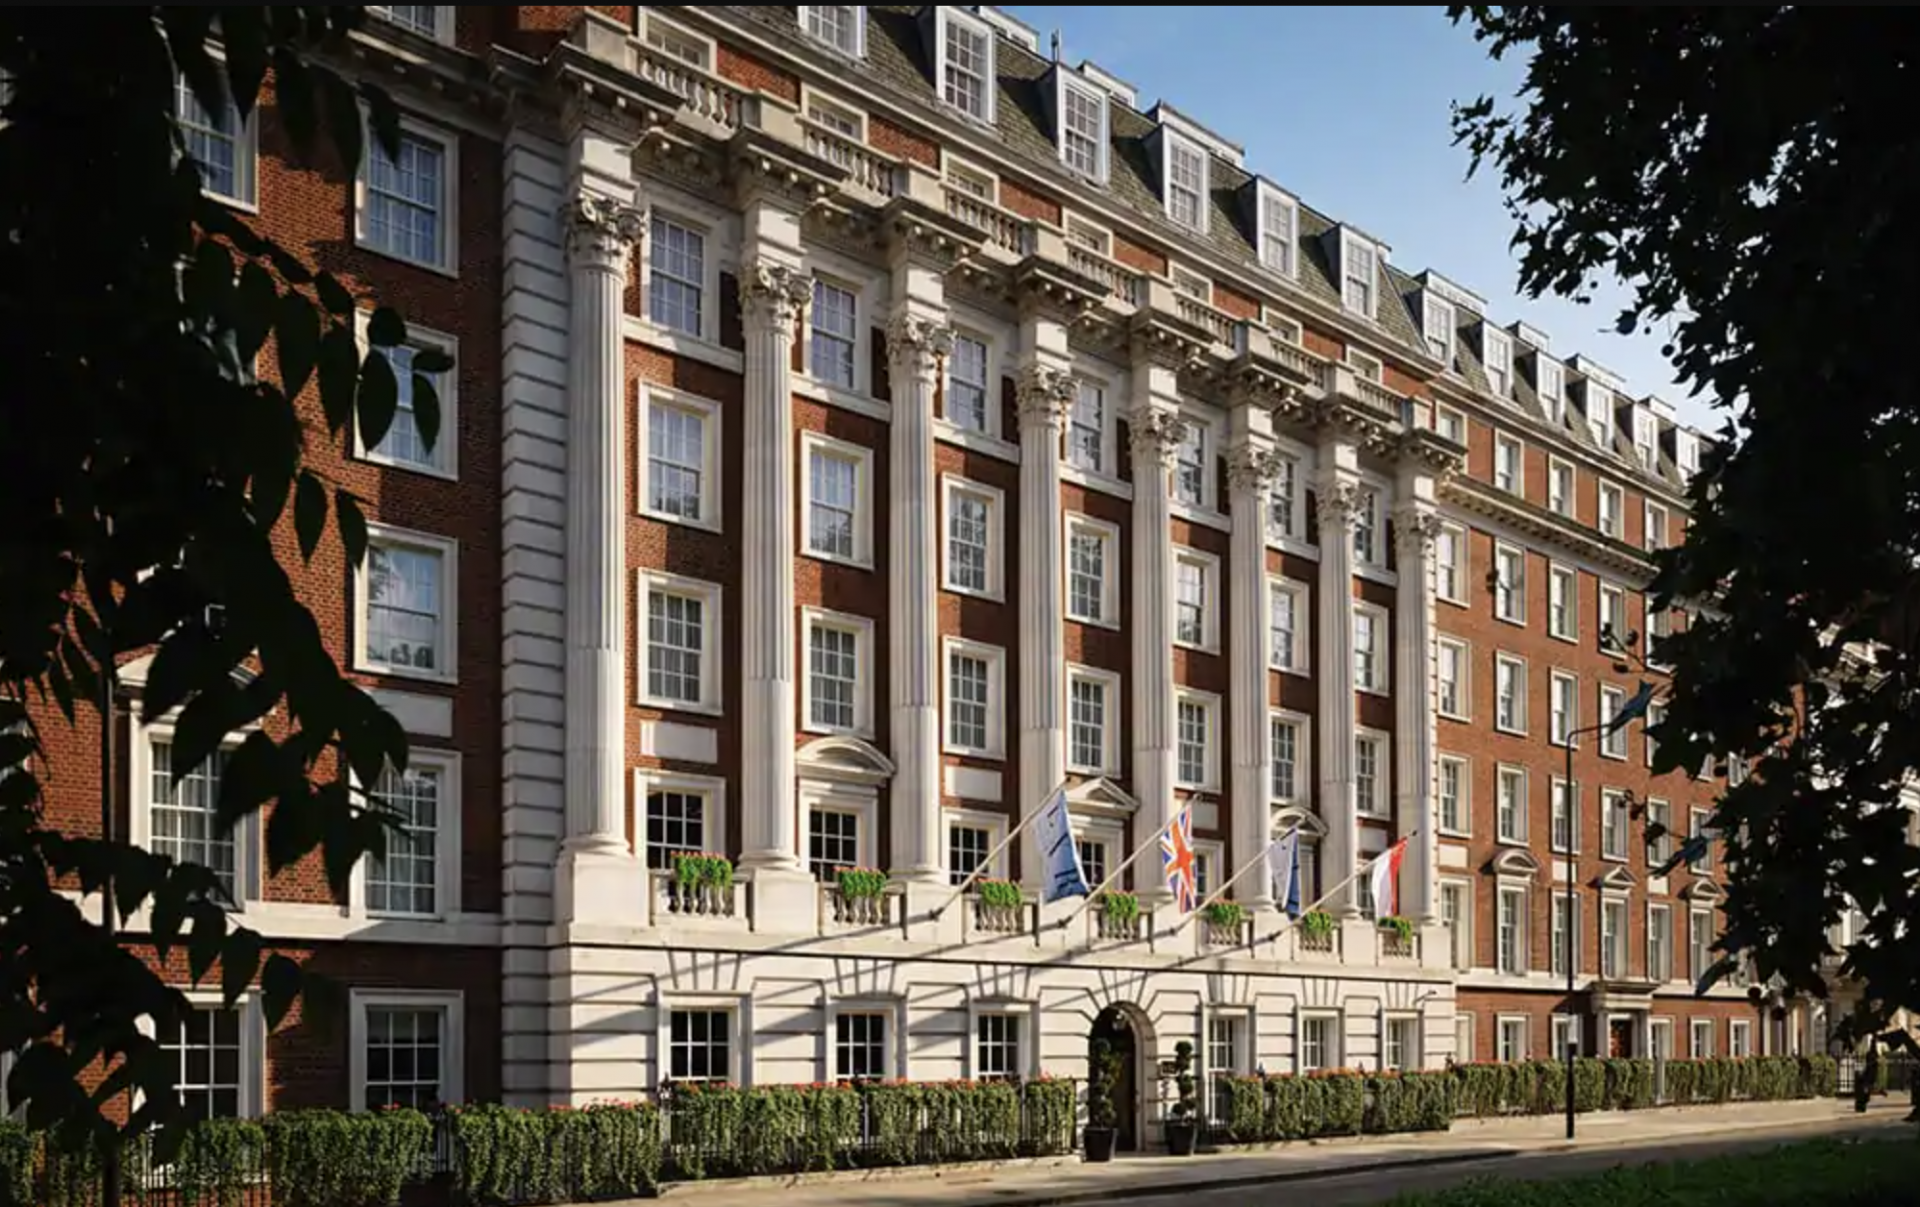 Biltmore Mayfair London Hilton LXR Hotel